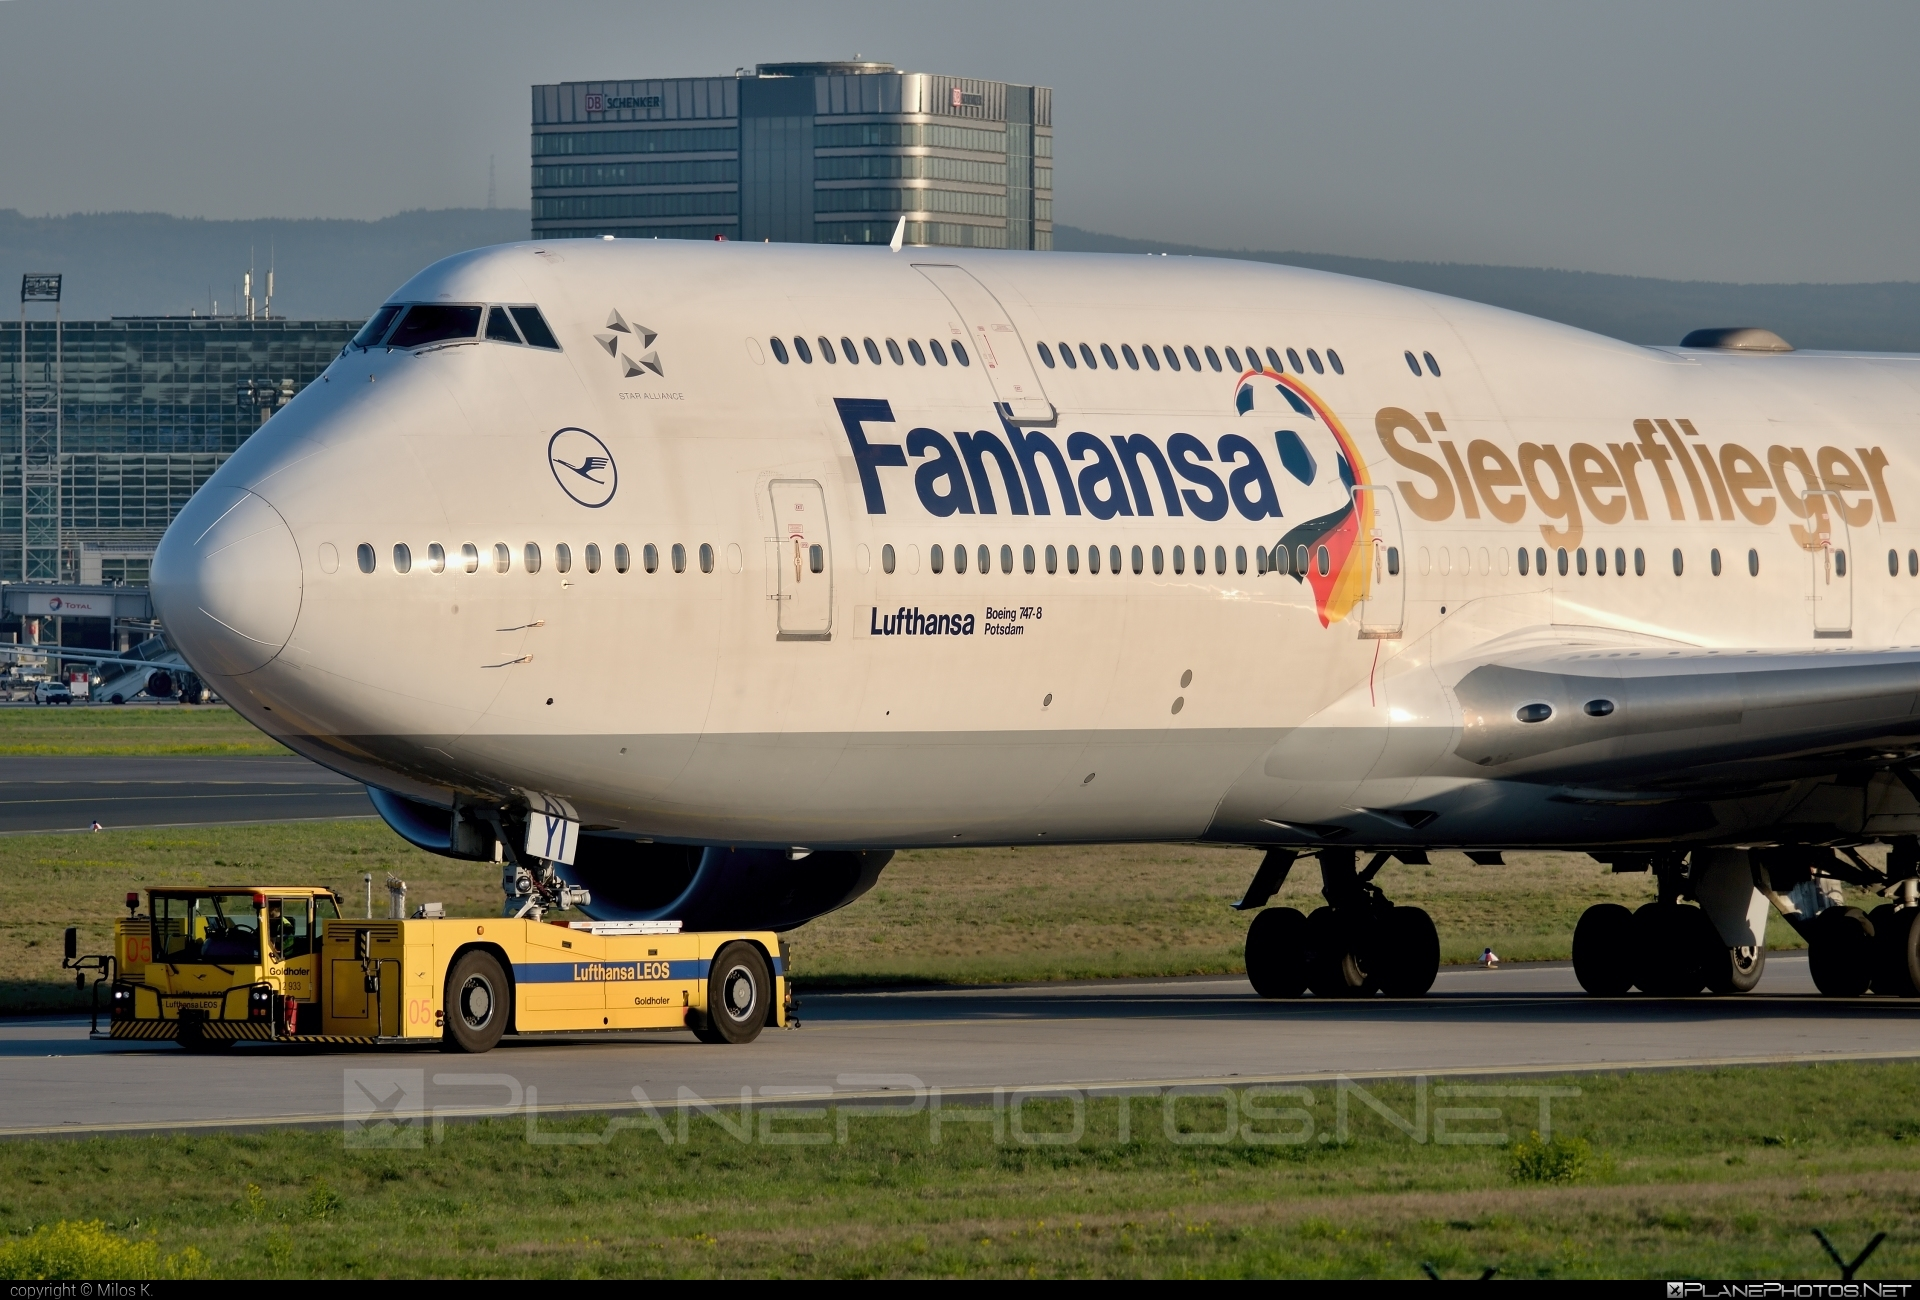 Boeing 747-8 - D-ABYI operated by Lufthansa #b747 #boeing #boeing747 #fanhansa #jumbo #lufthansa #siegerflieger